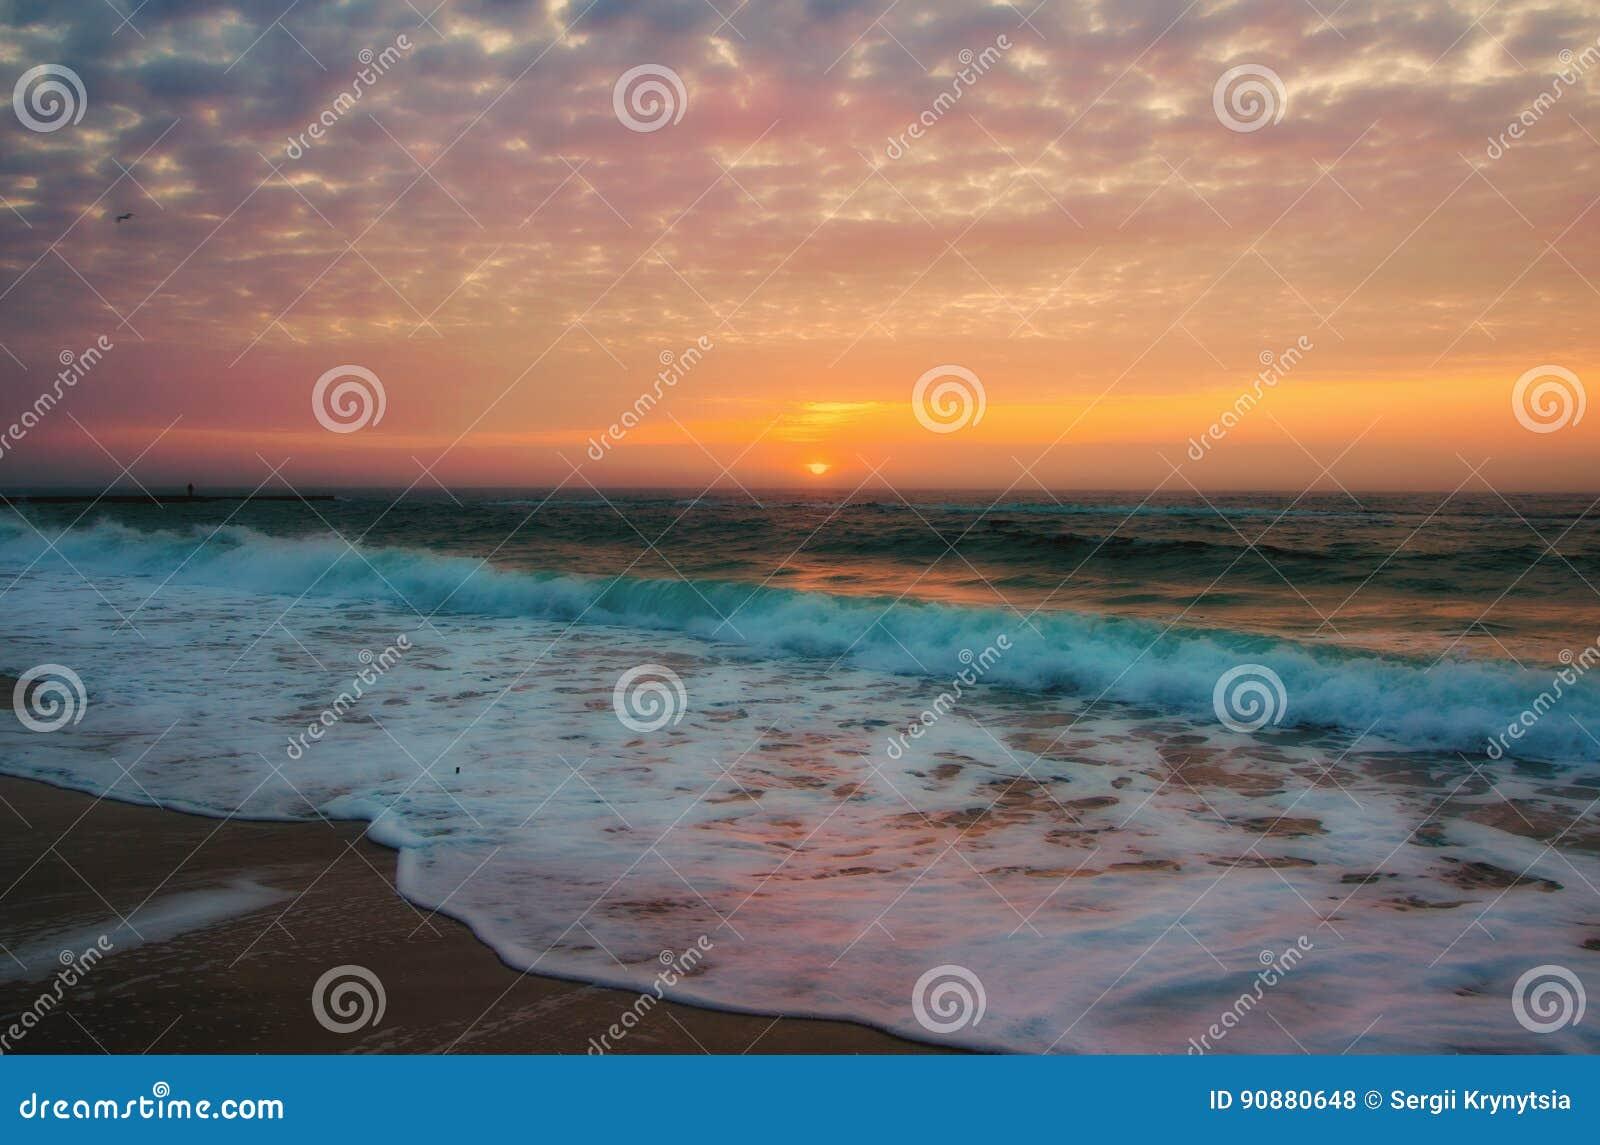 Magnificent sunrise over sea